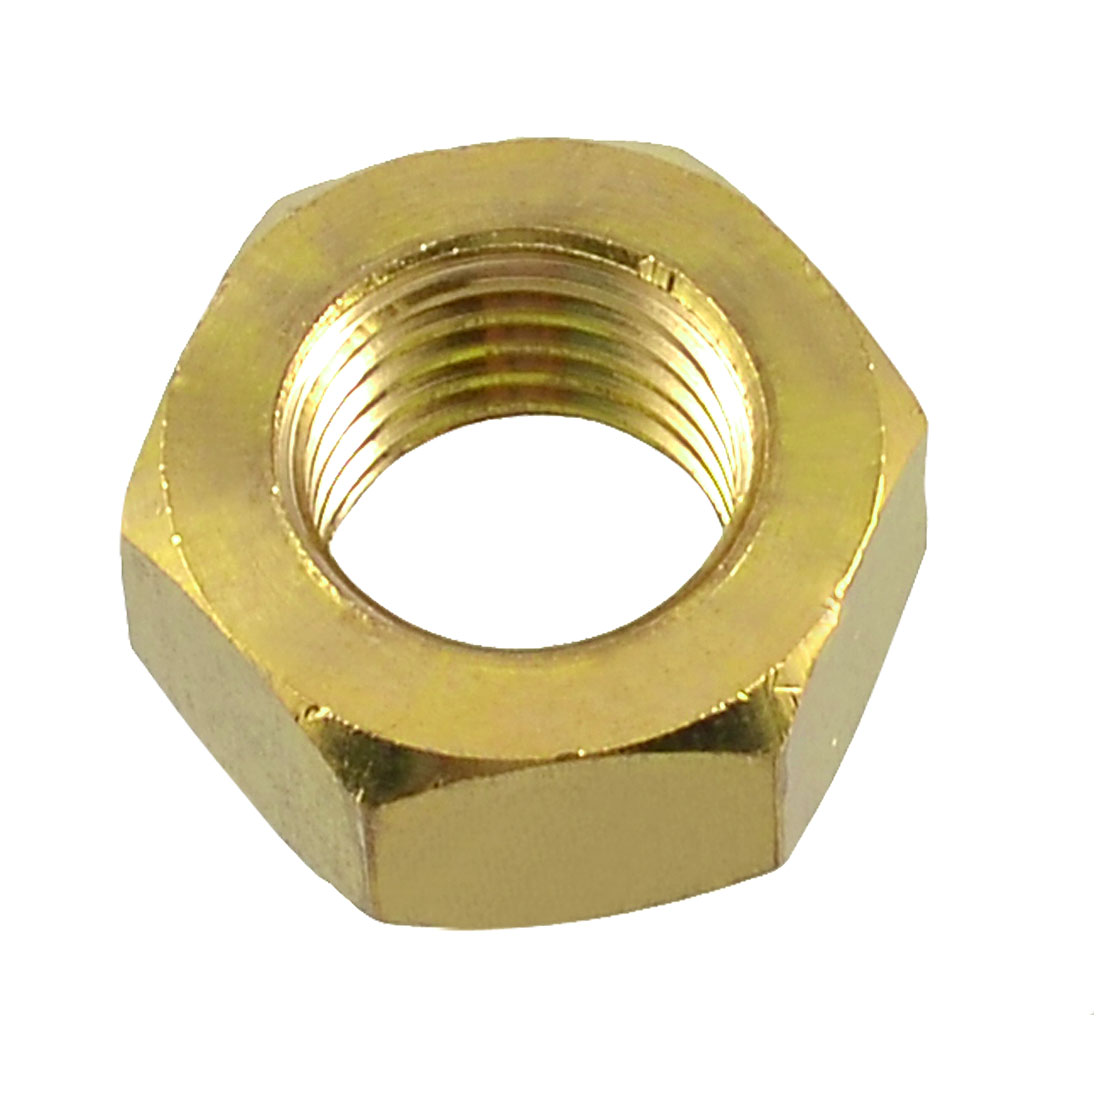 Brass M20 20mm Diameter Thread Hexagonal Hex Head Screw Nut